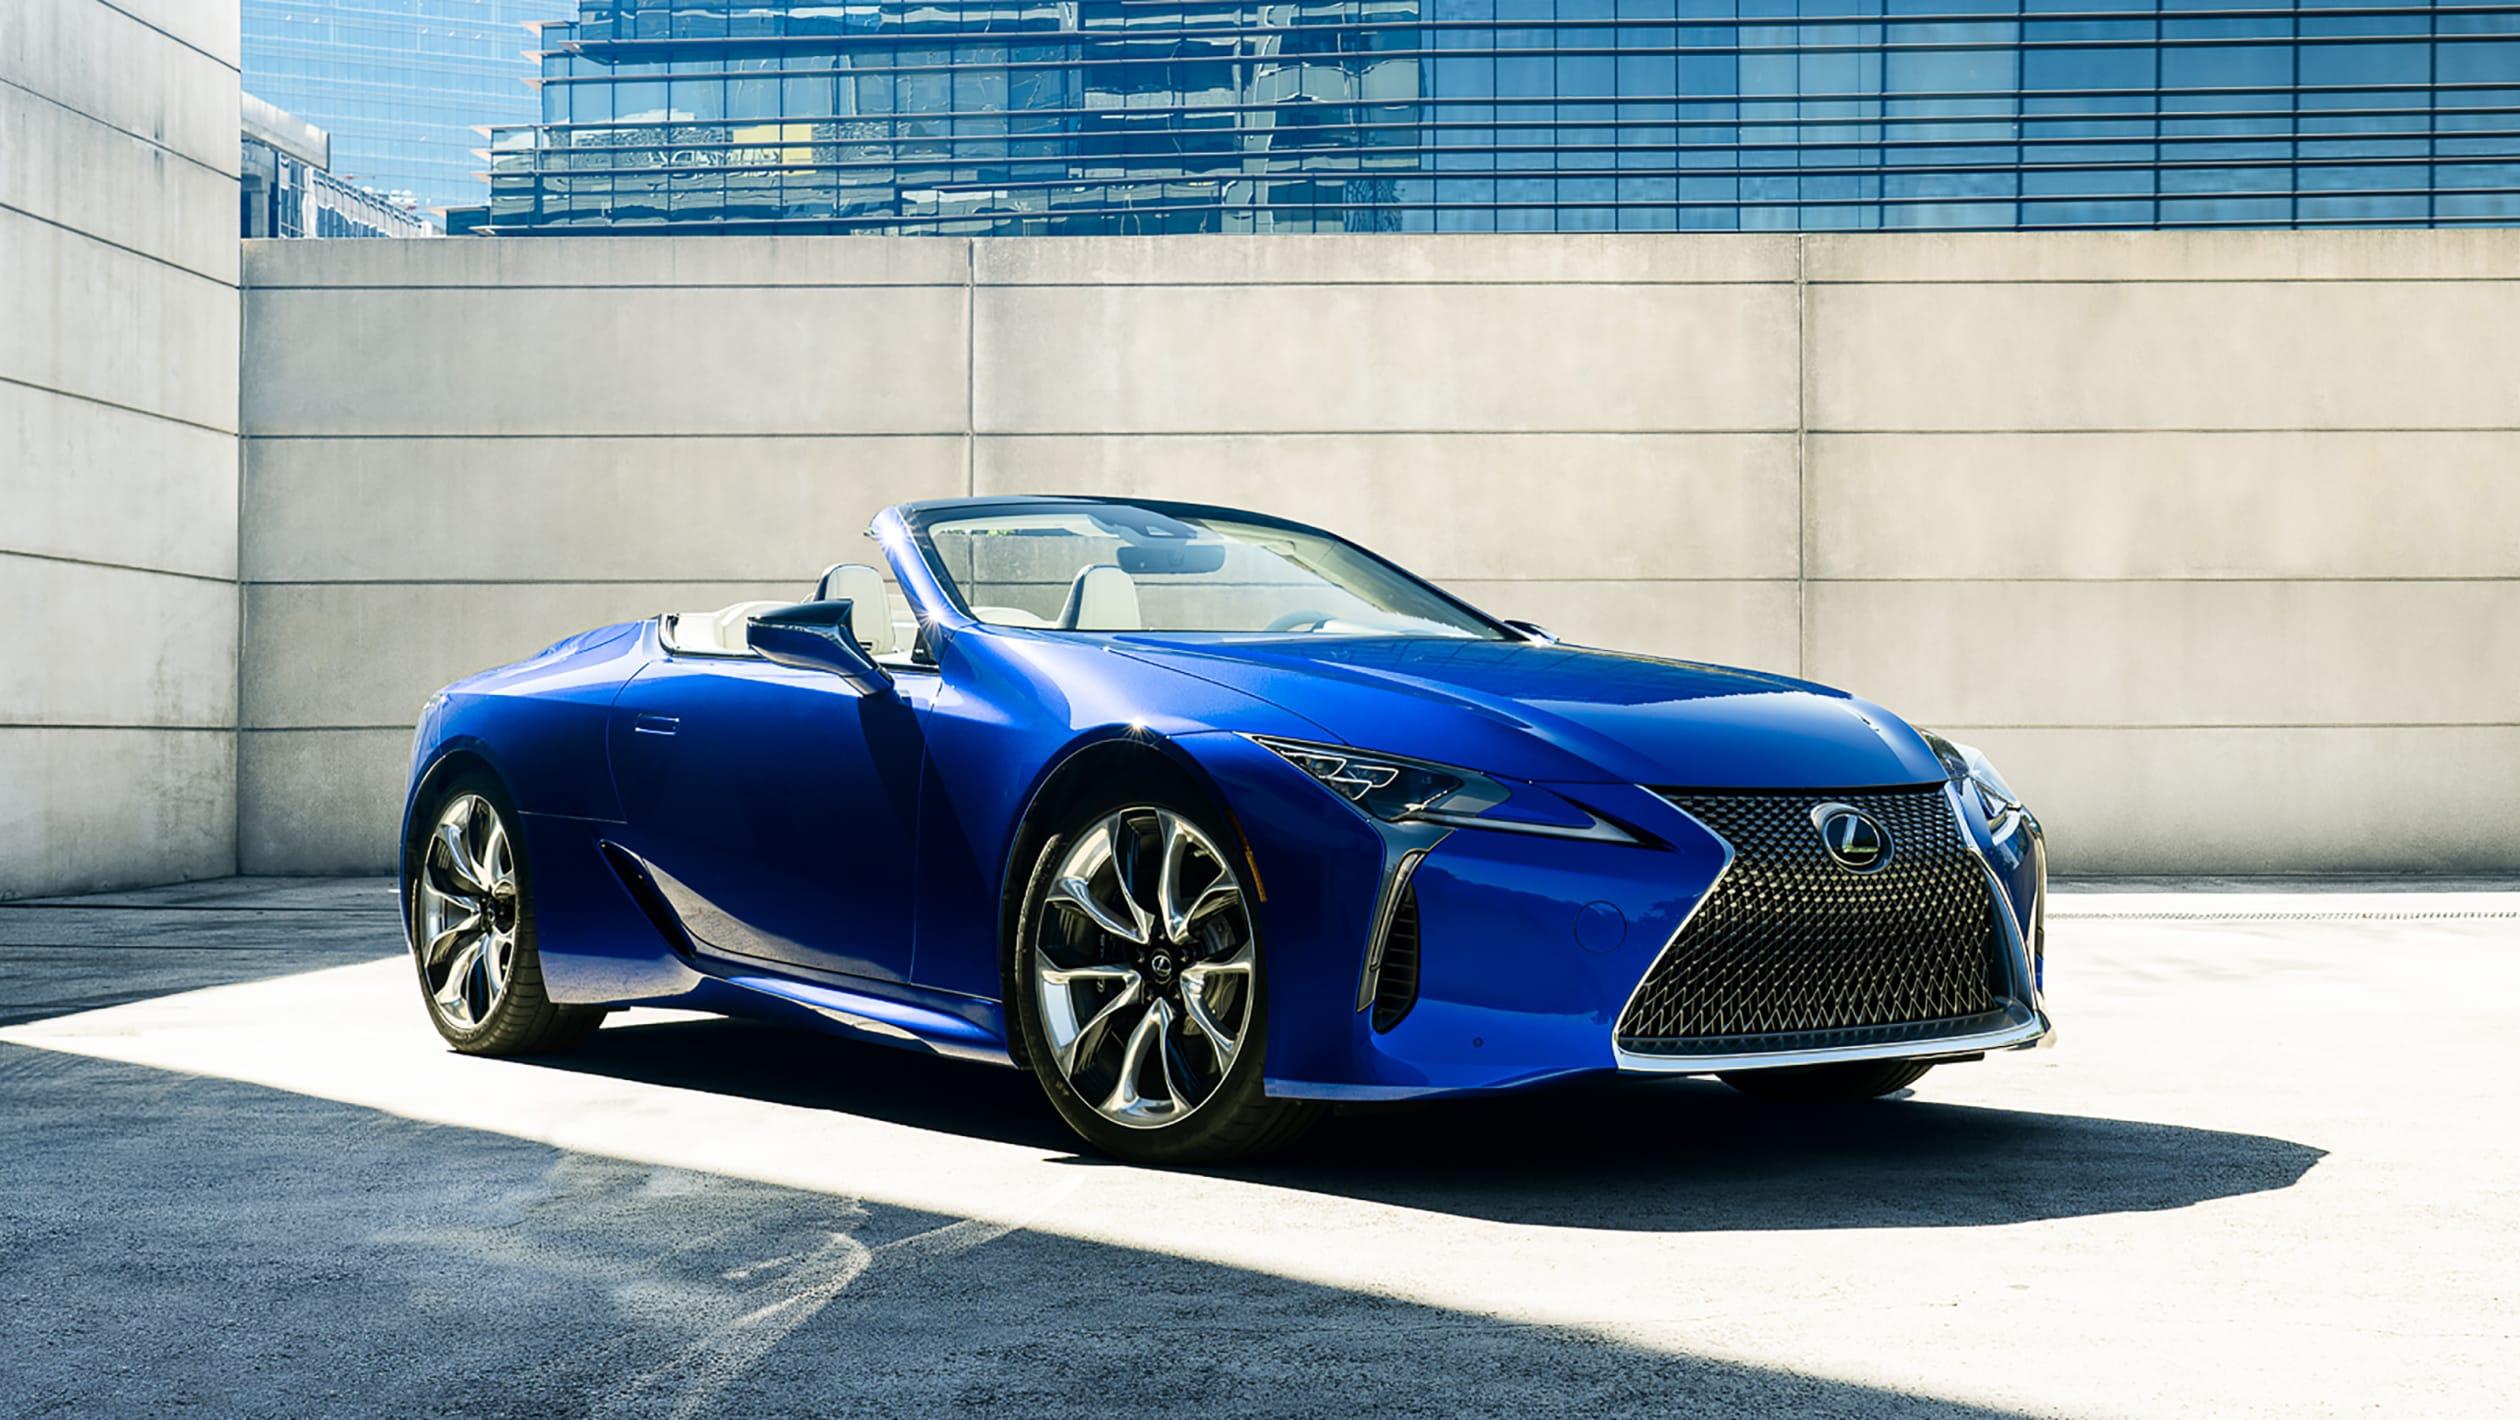 2016 - [Lexus] LC 500 - Page 8 Lexus%20LC%20500%20Convertible%20Regatta-2